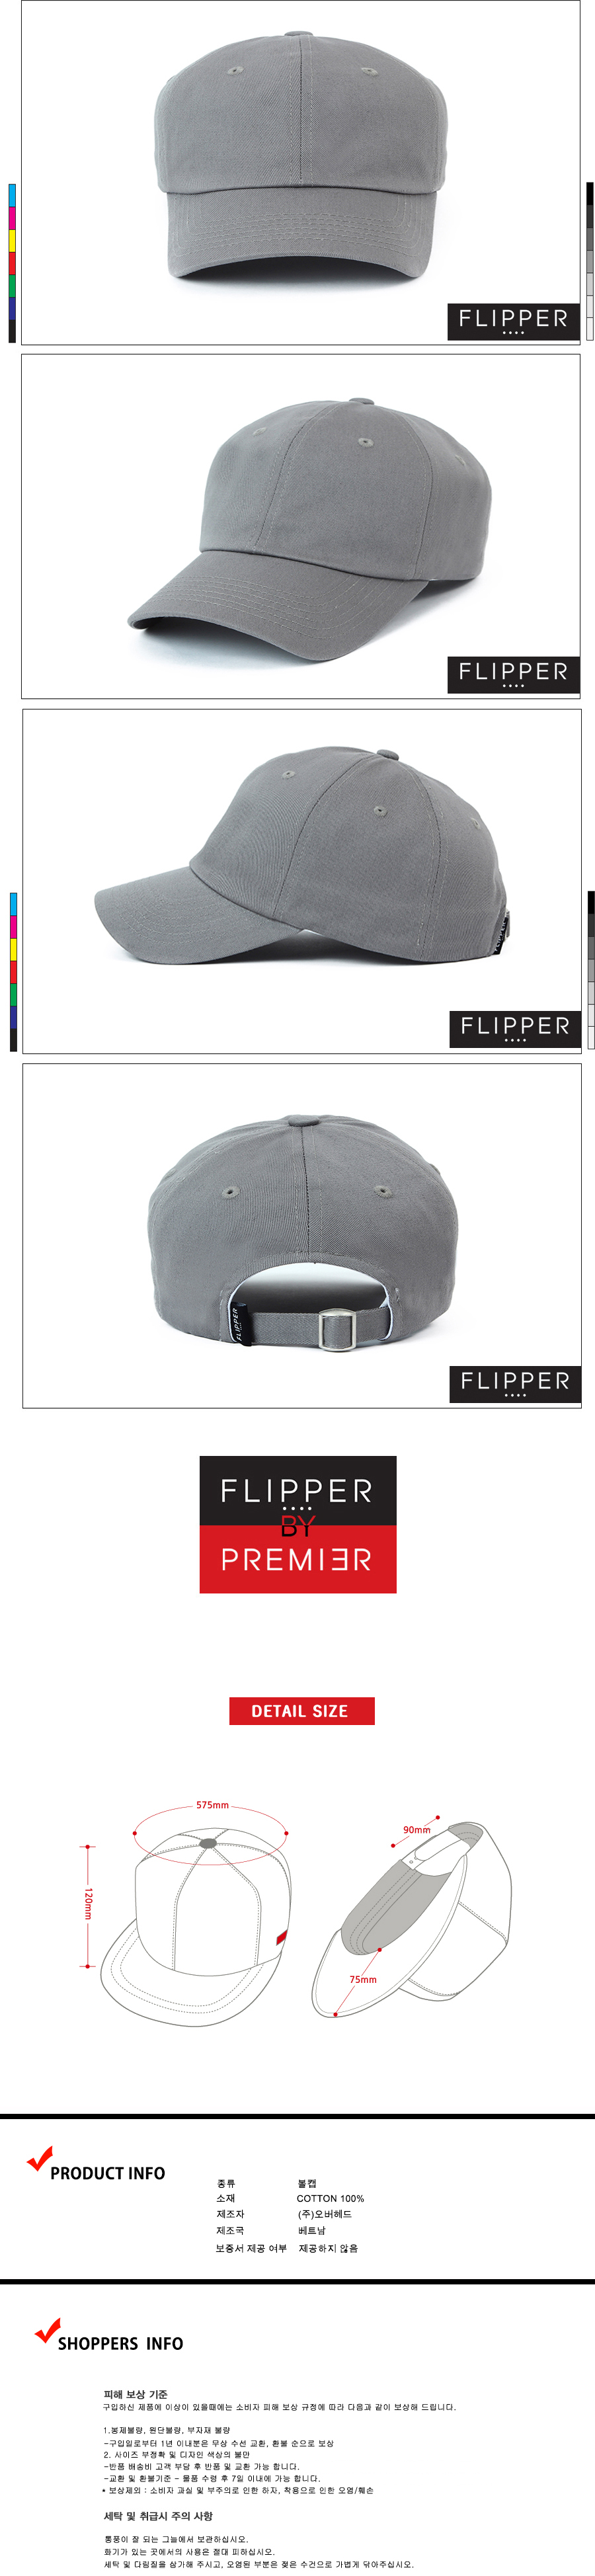 [ PREMIER ] [卓越]翻转球帽一种颜色自定义灰色(FL195)